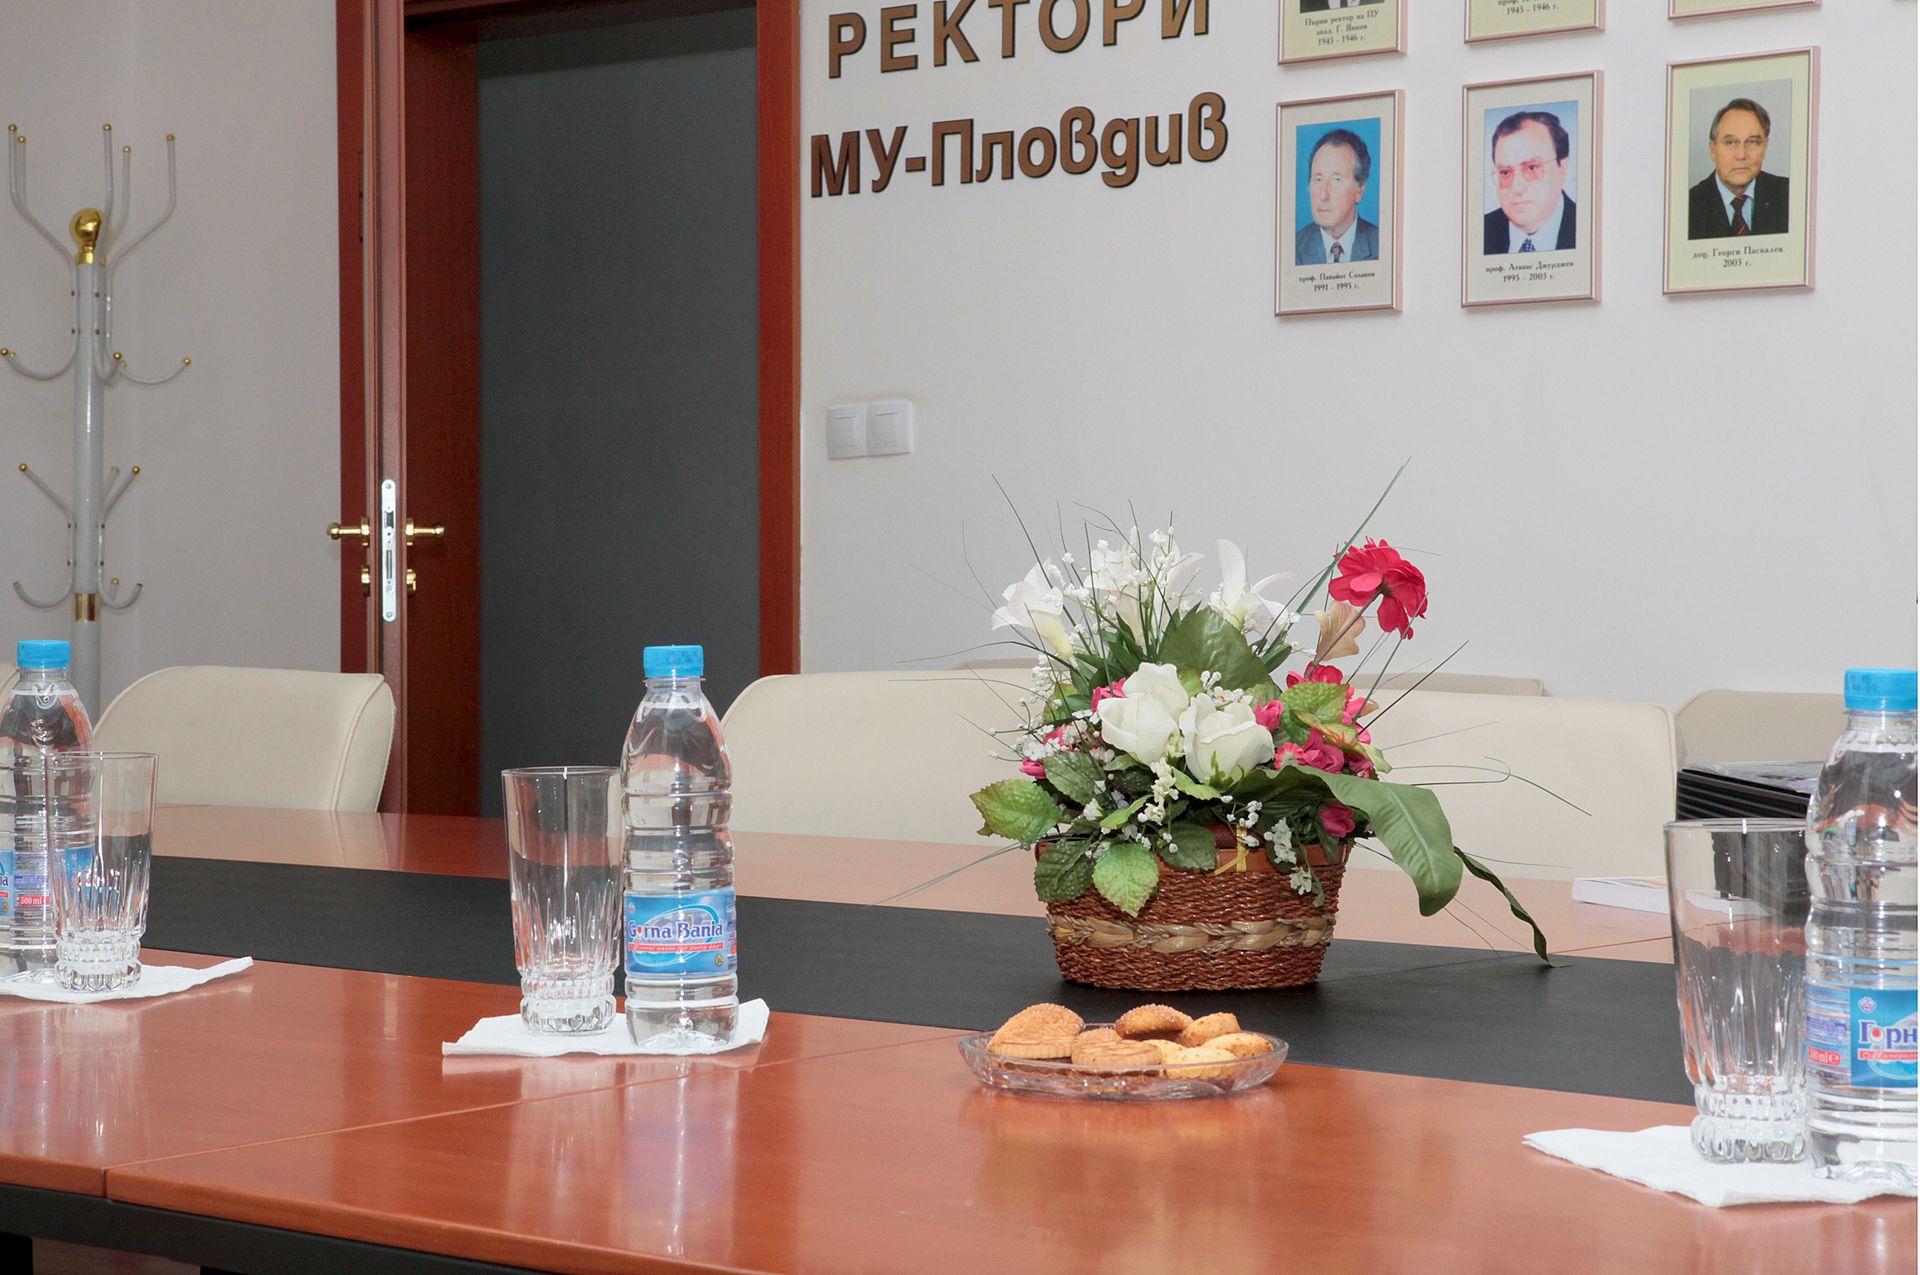 Ректорат на Медицински университет - Пловдив